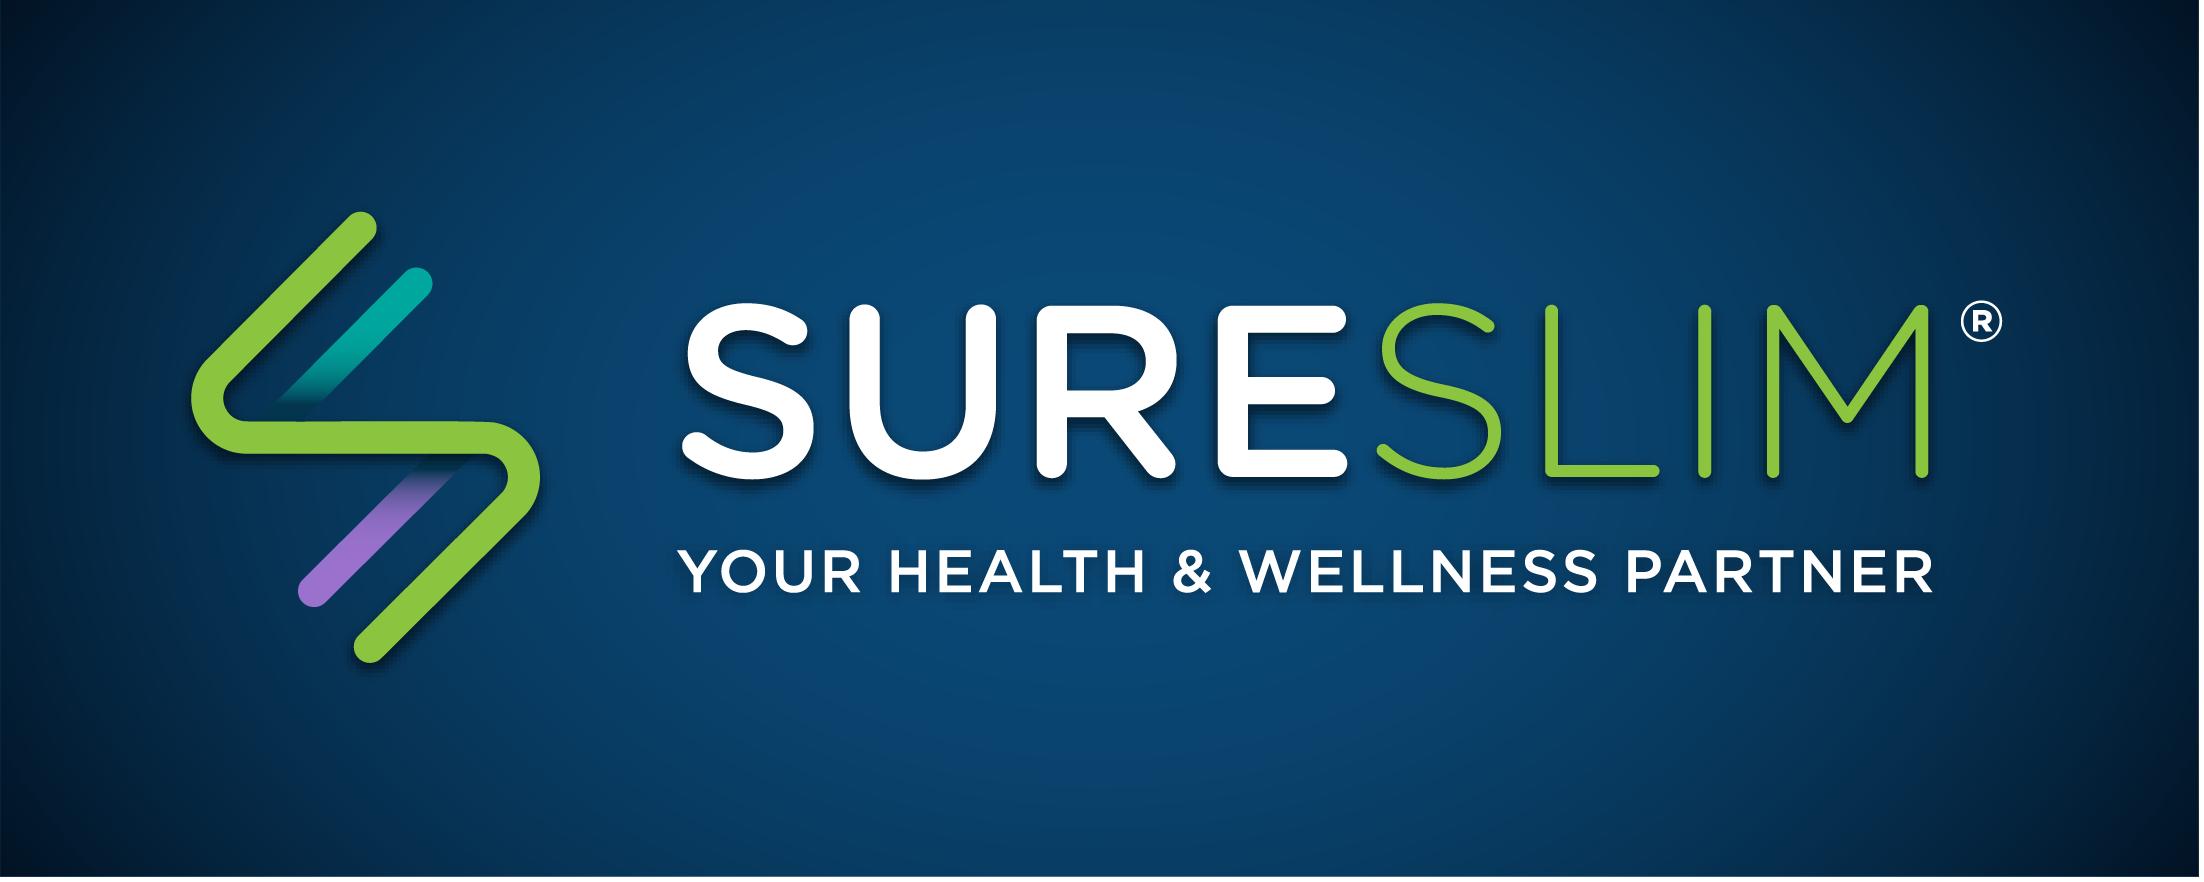 find us | SureSlim Health & Wellness | Africa